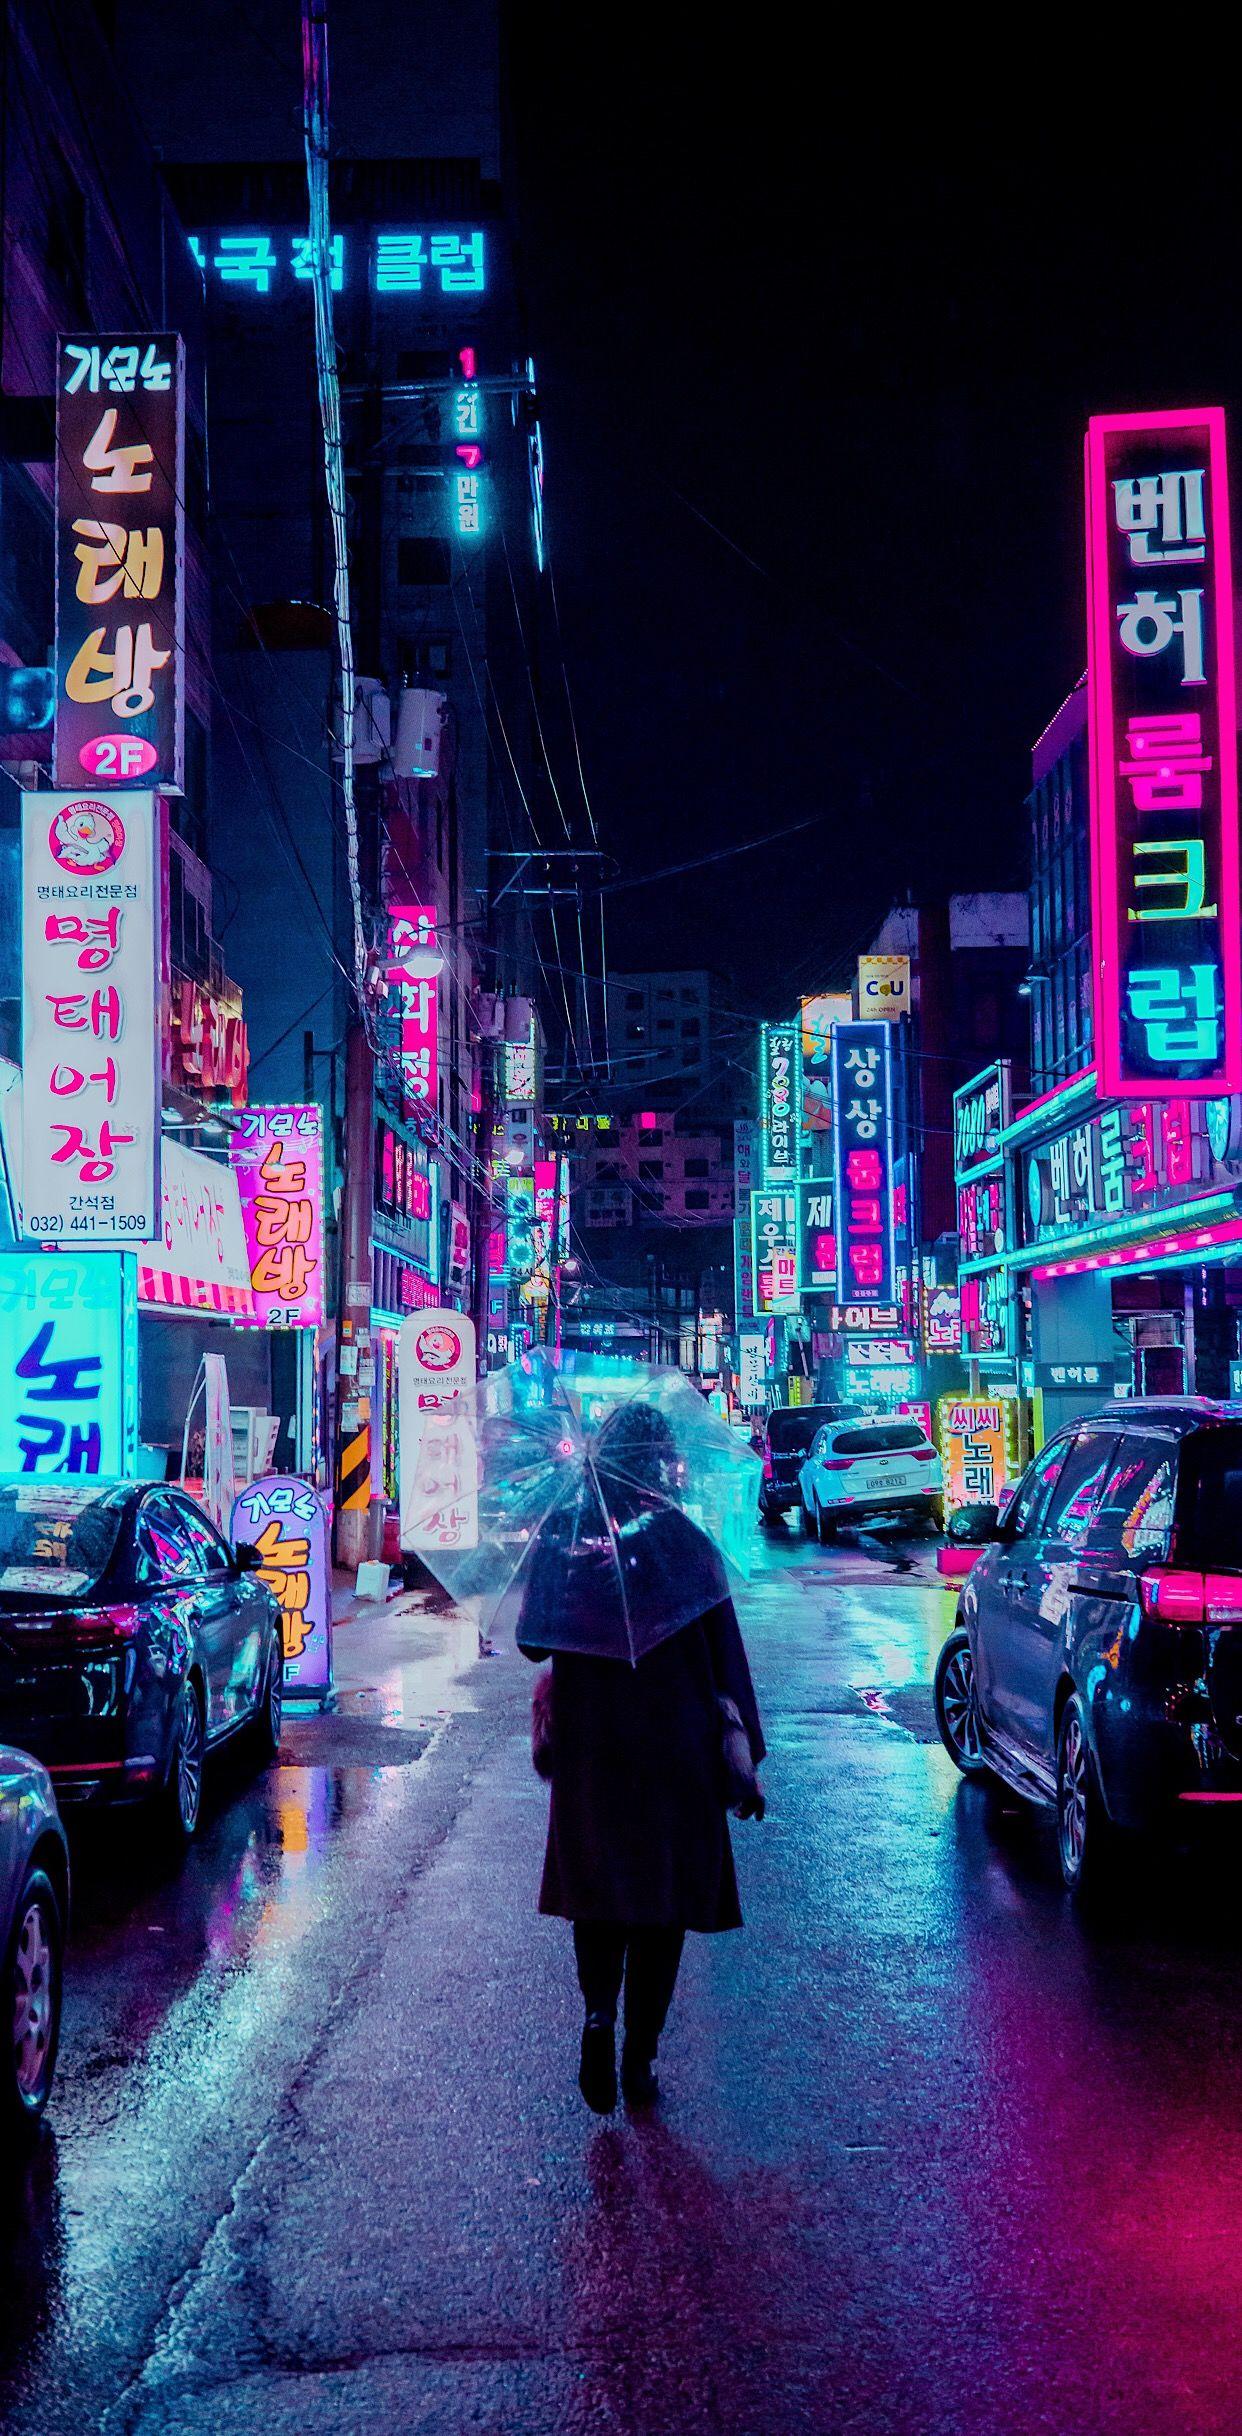 Neon City Wallpaper for Desktop and Mobiles iPhone 6 6S